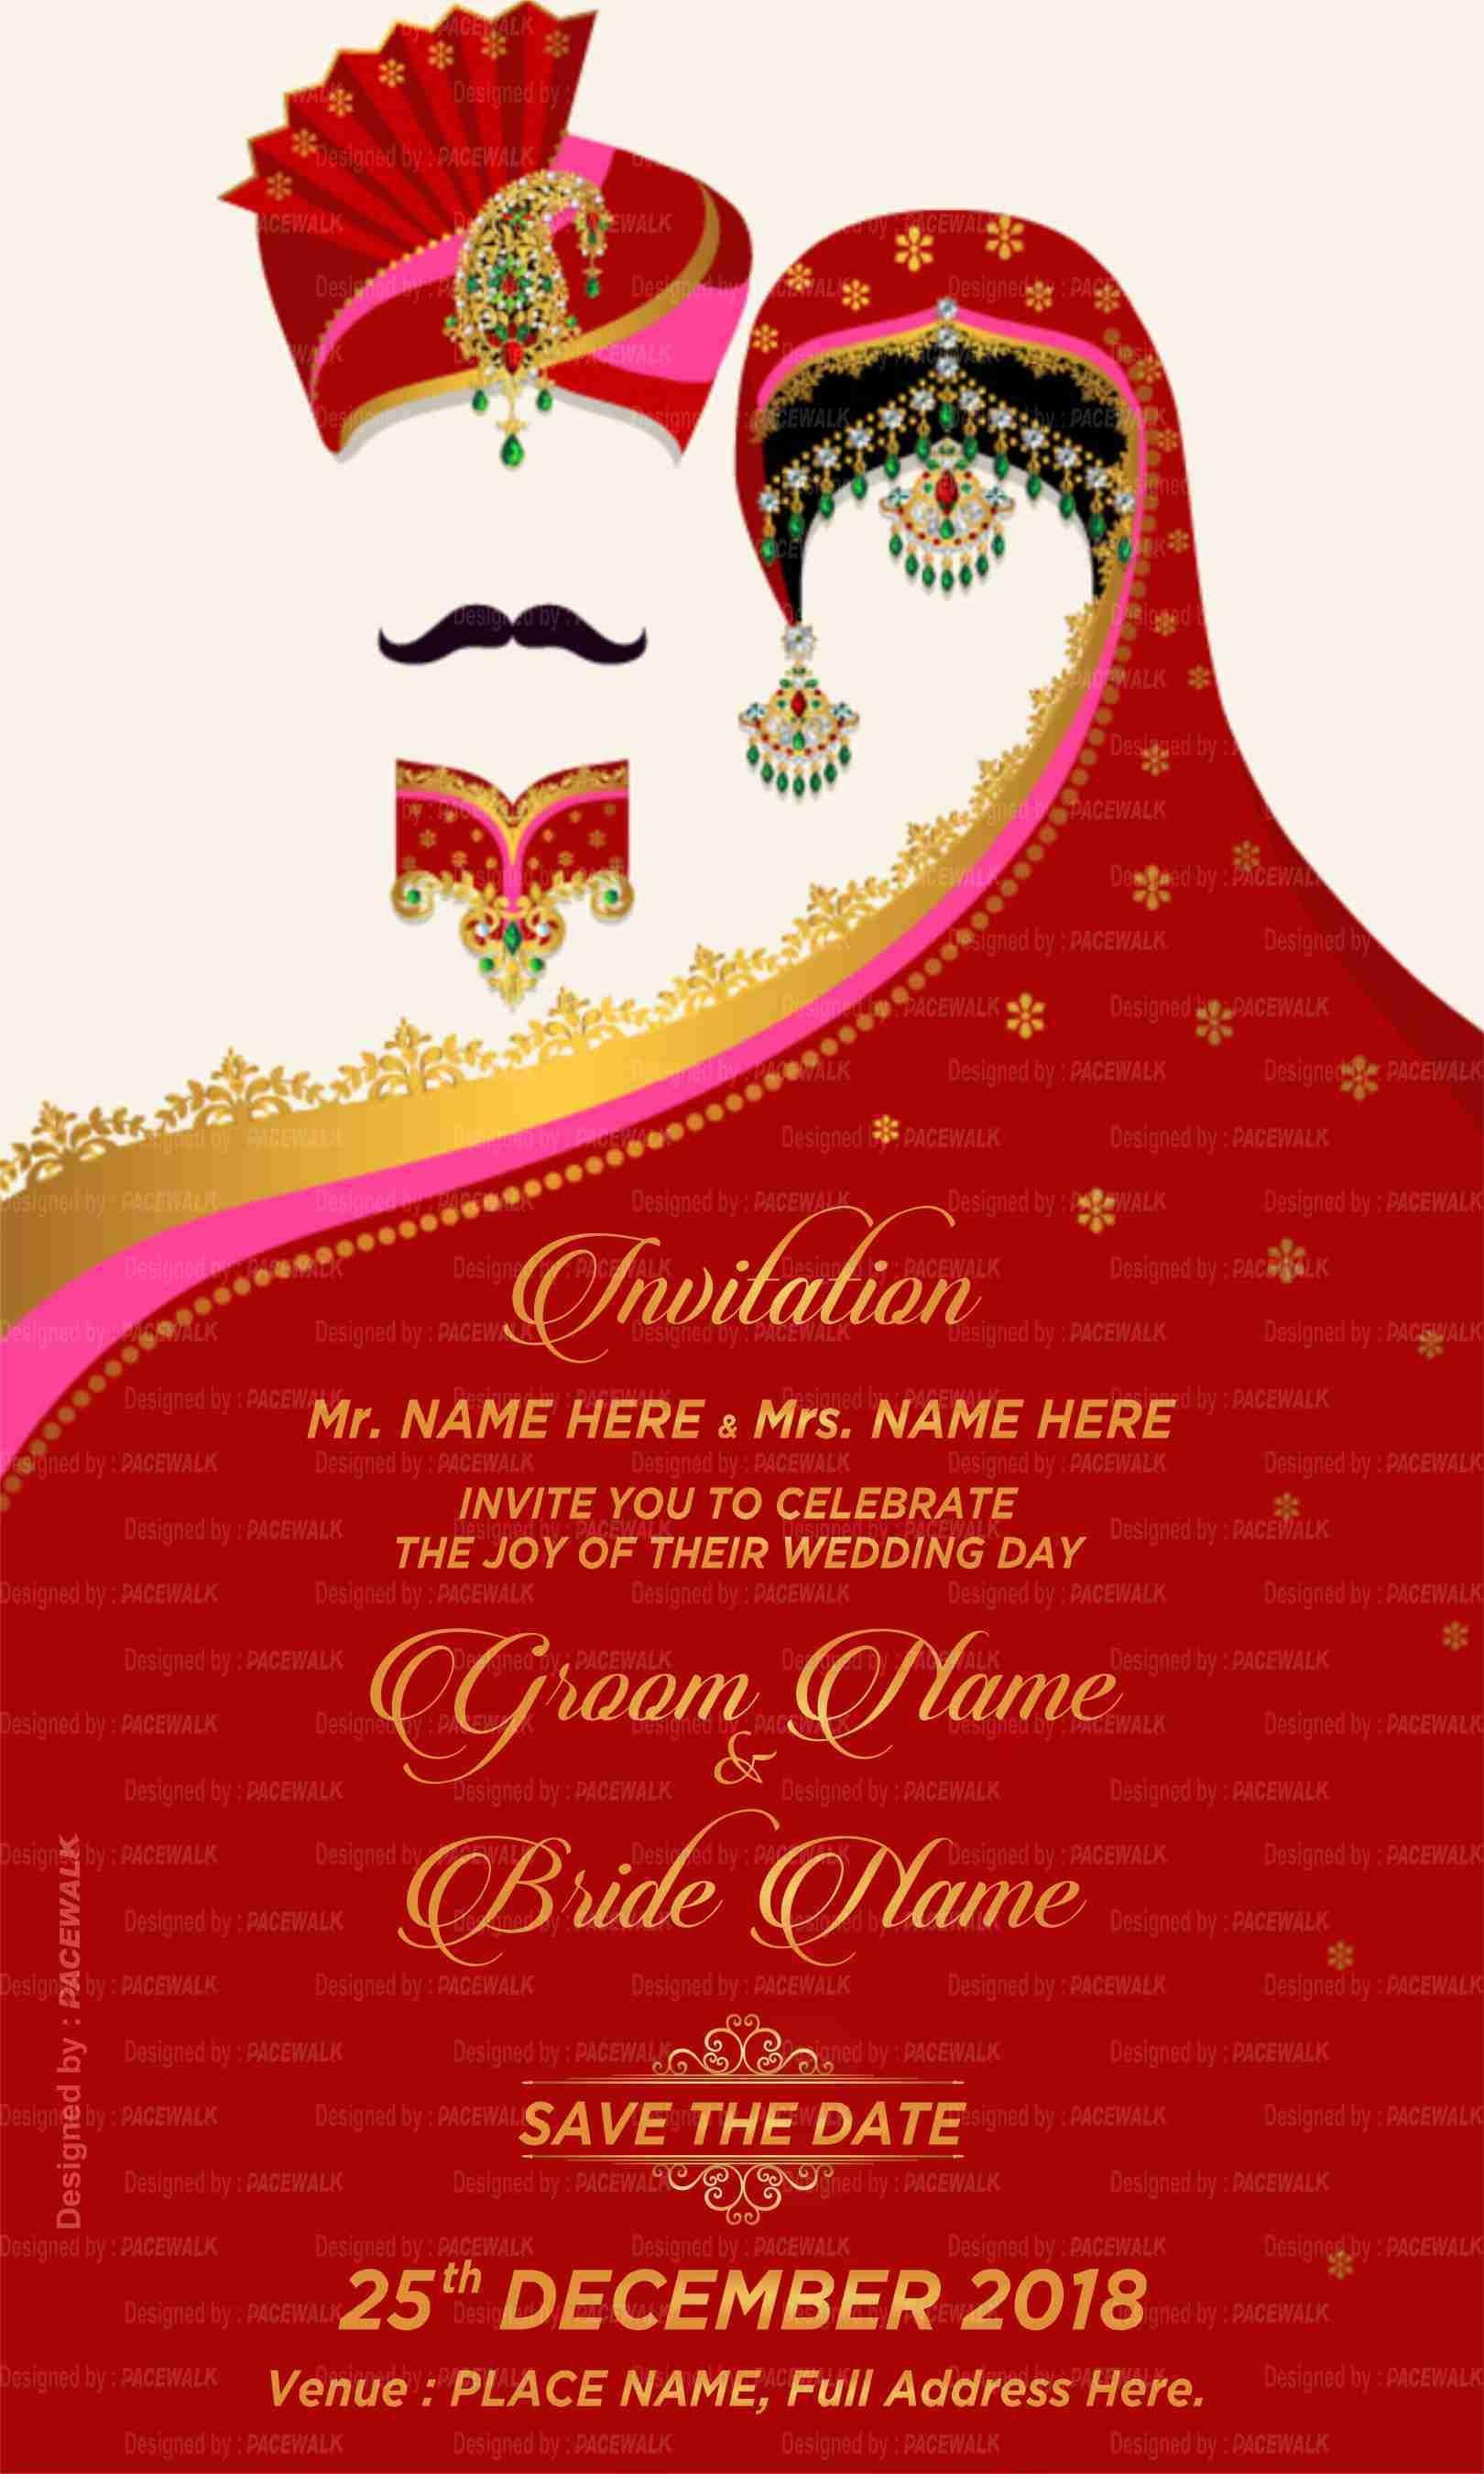 Wedding Invitation Video Maker Online Indian Wedding Invite Makers Wedding Invitation Maker Wedding Invitation Video Wedding Invitation Card Design